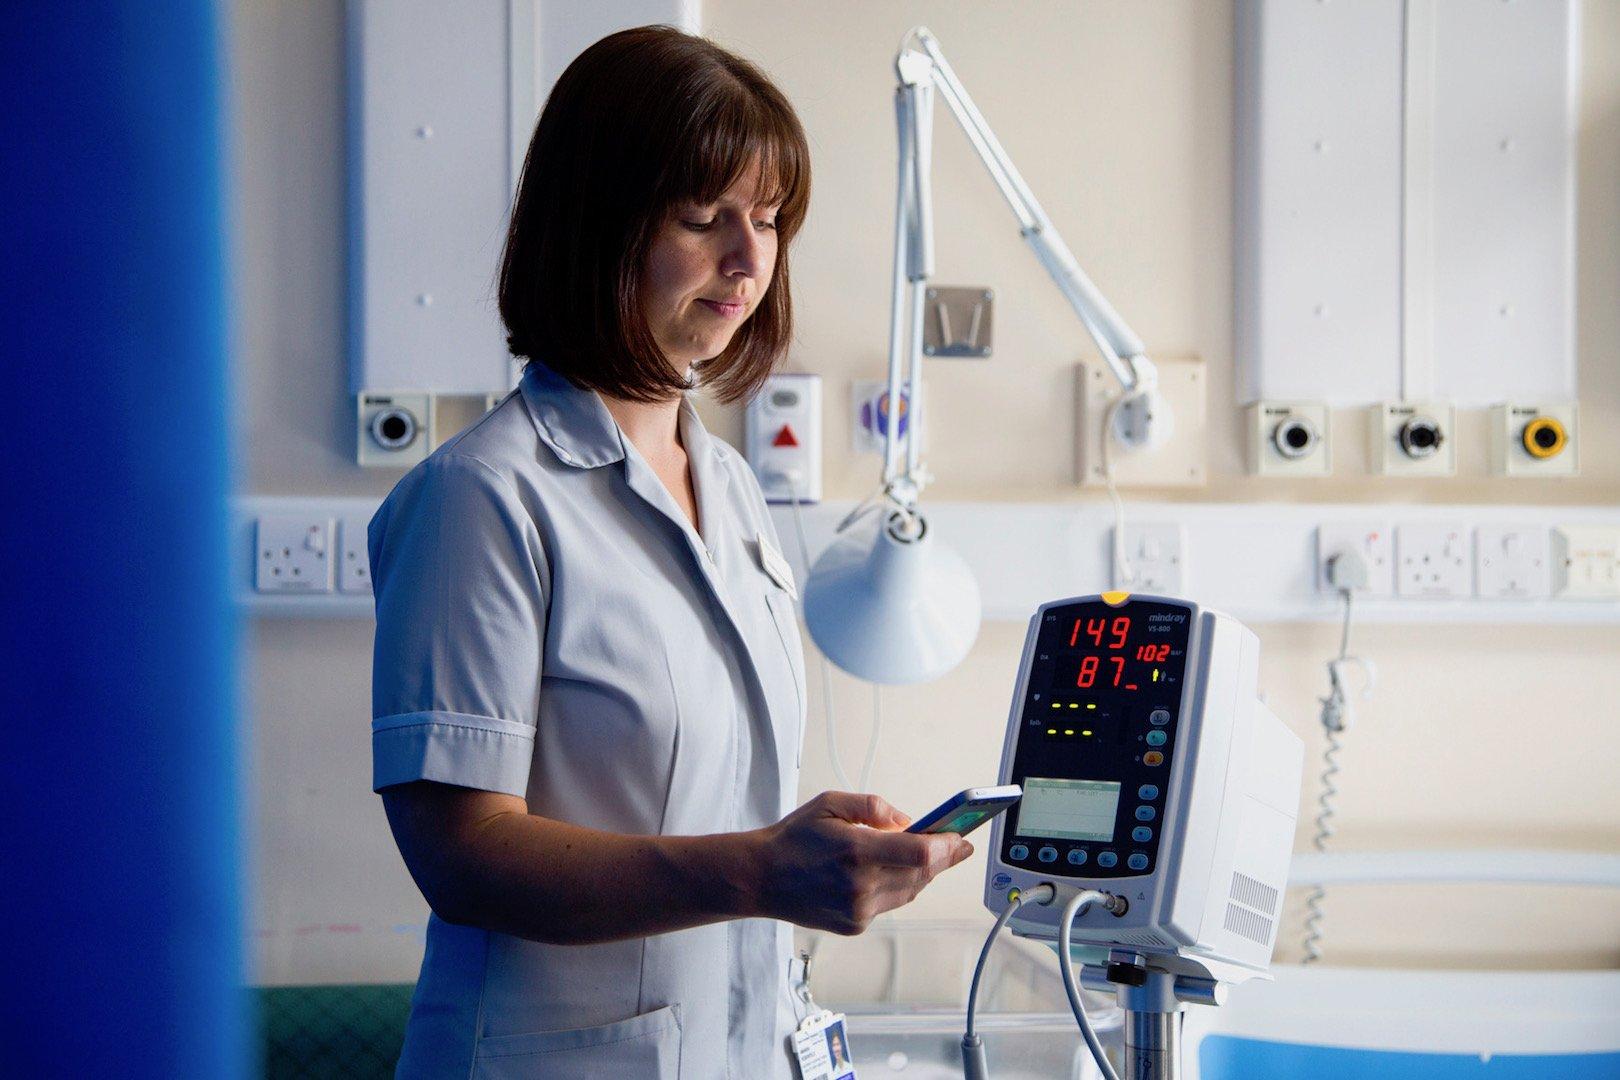 Clinician using a work phone